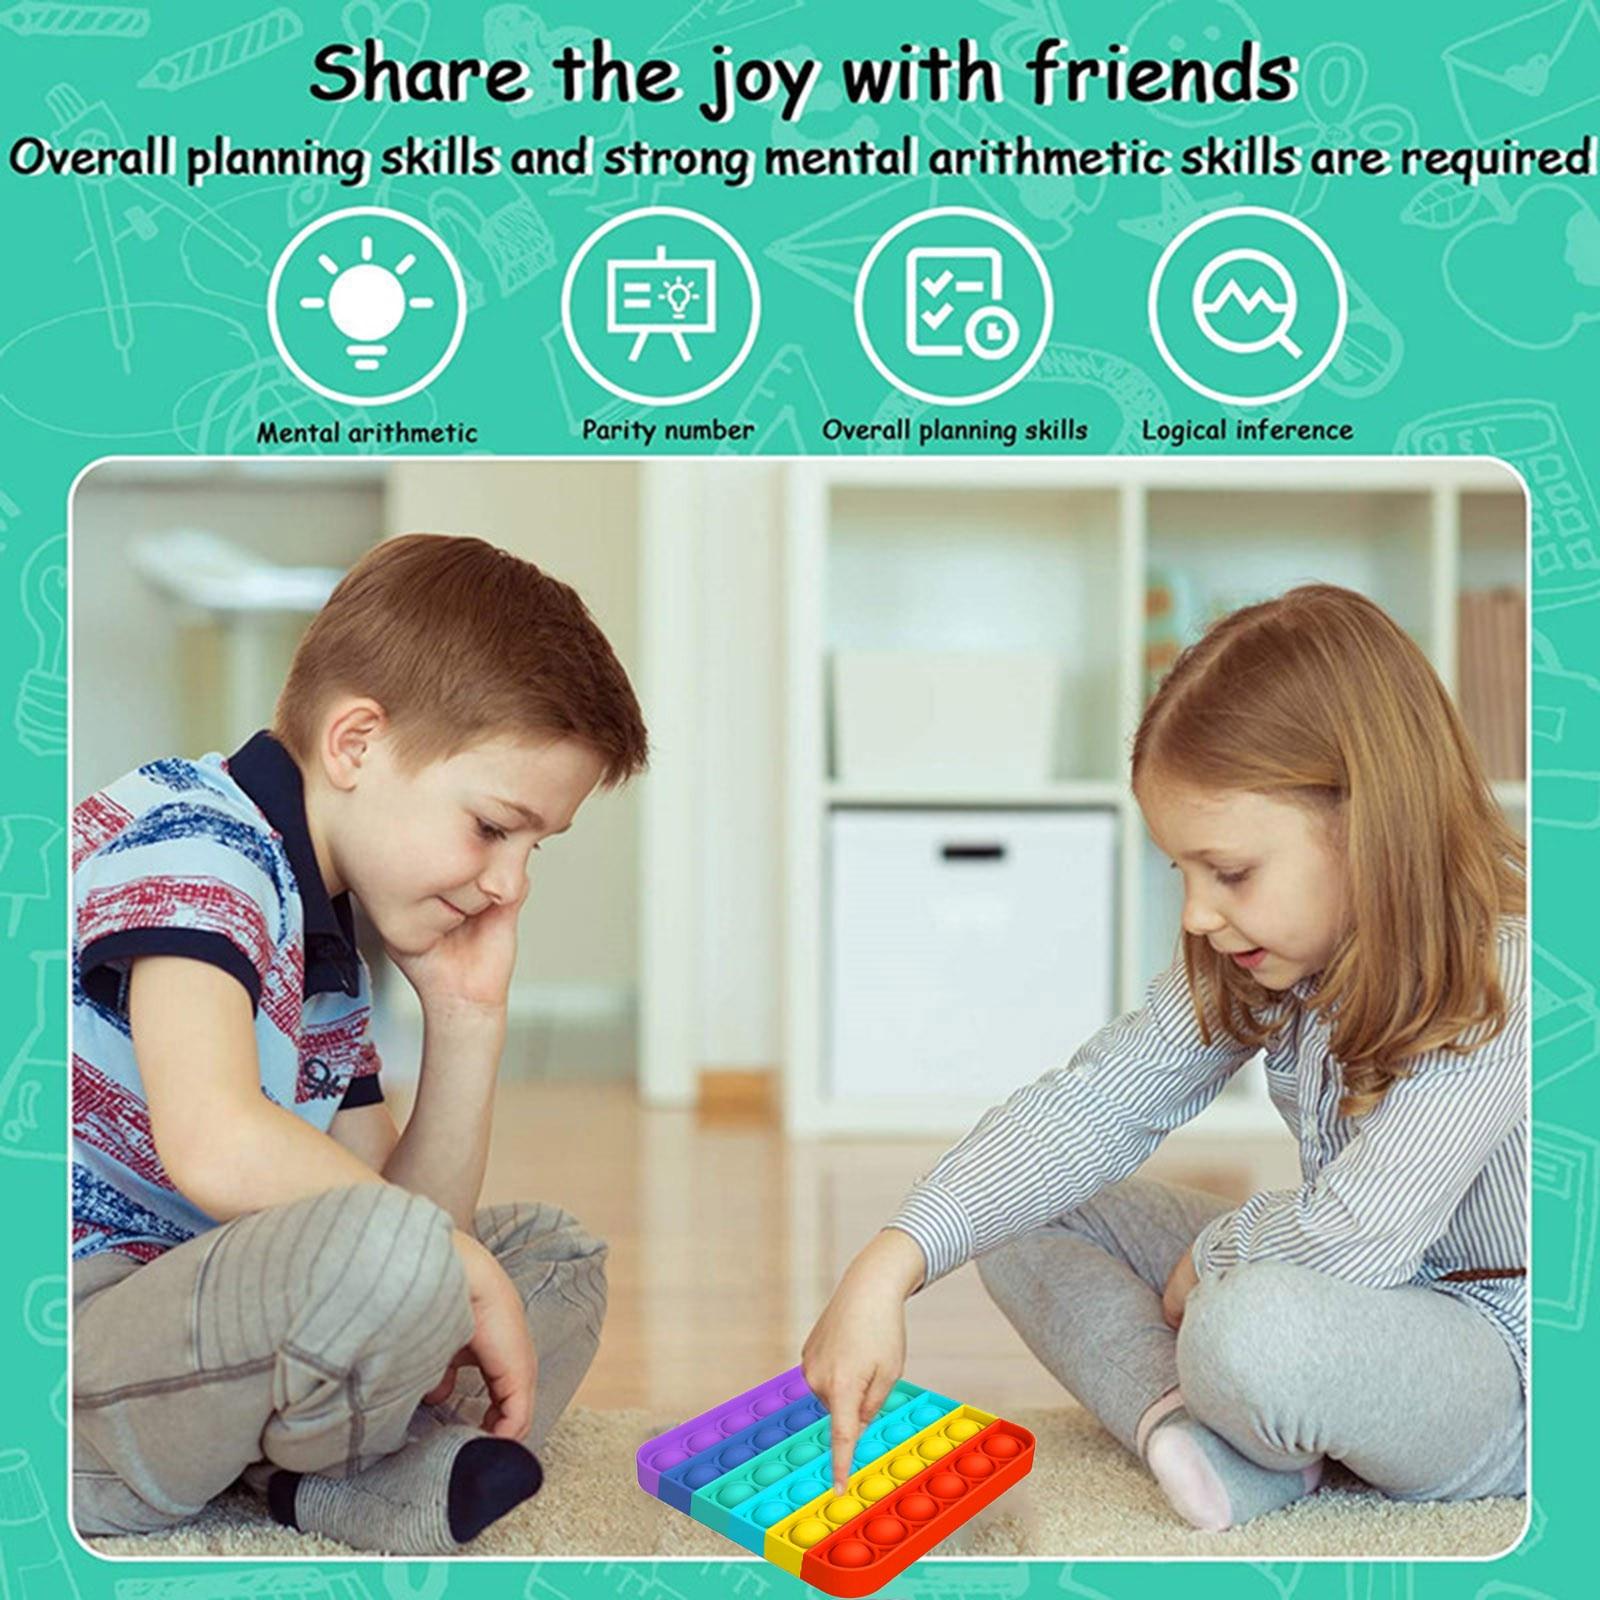 Fitget-Toys Sensory-Toy Autism Fidget Needs-Stress Pop-It-Game Push Bubble Reliever Popoit img5